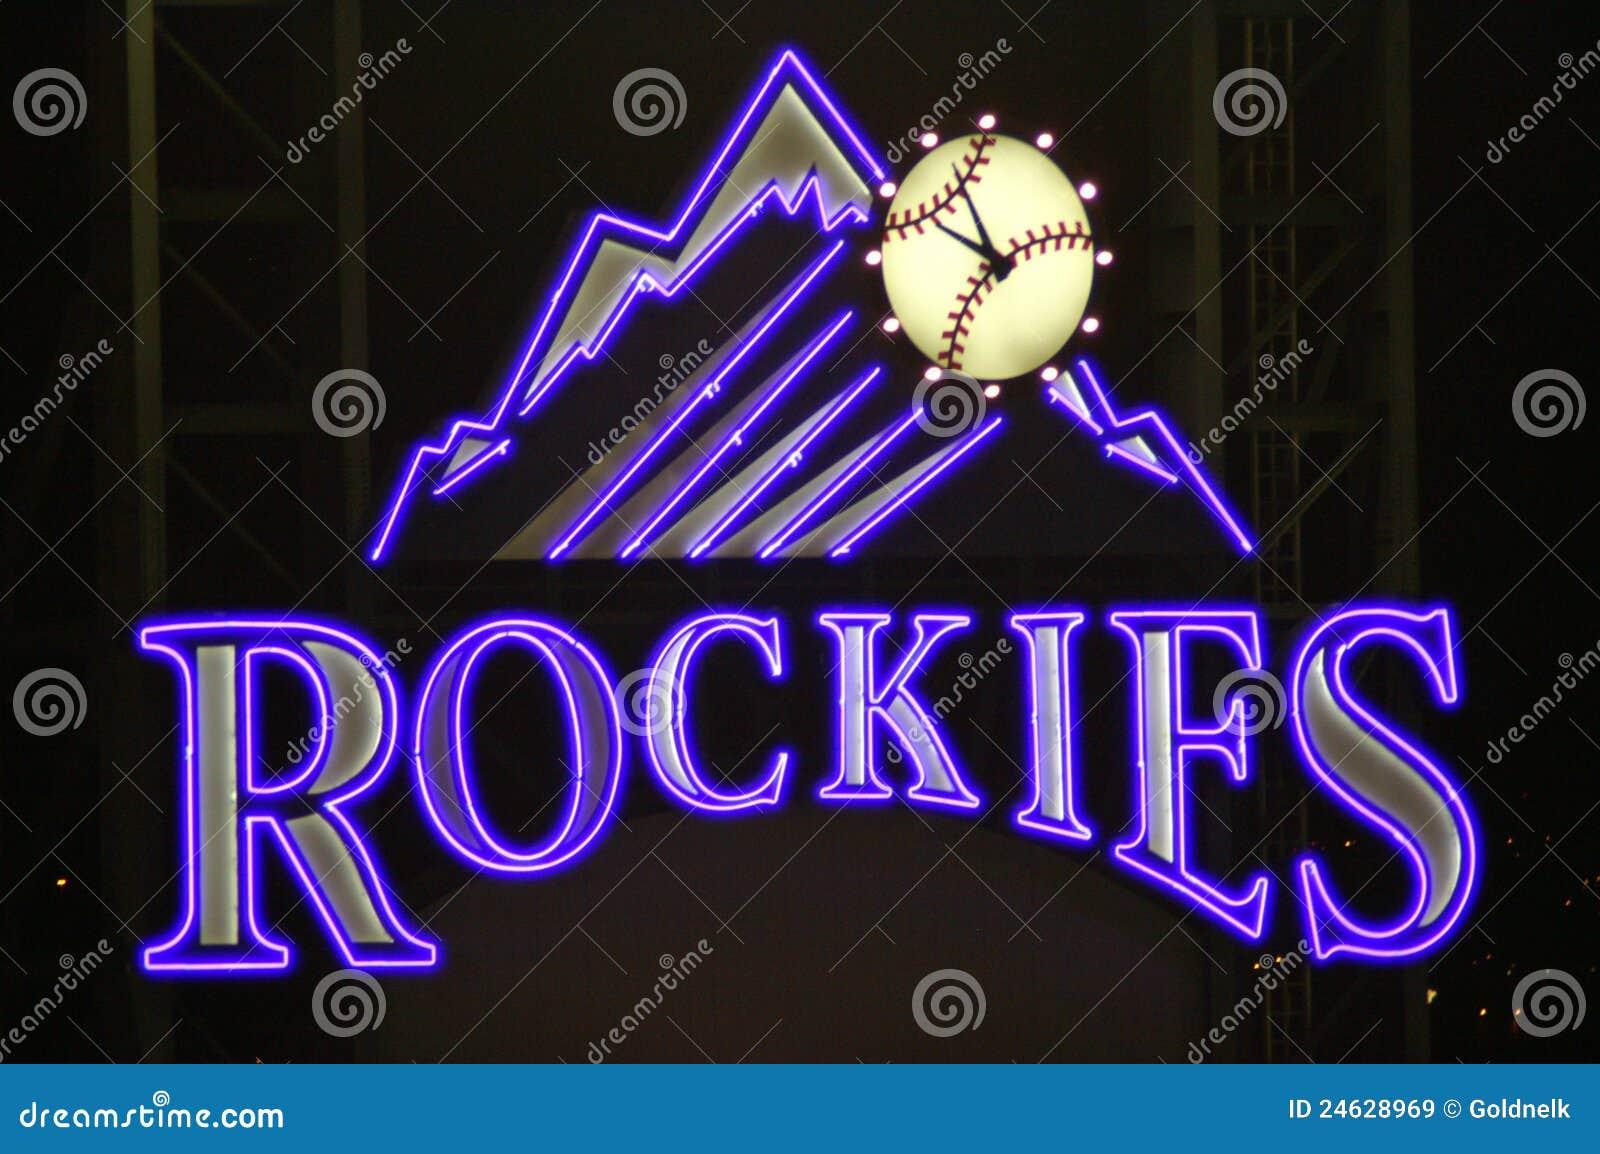 Rockies sign